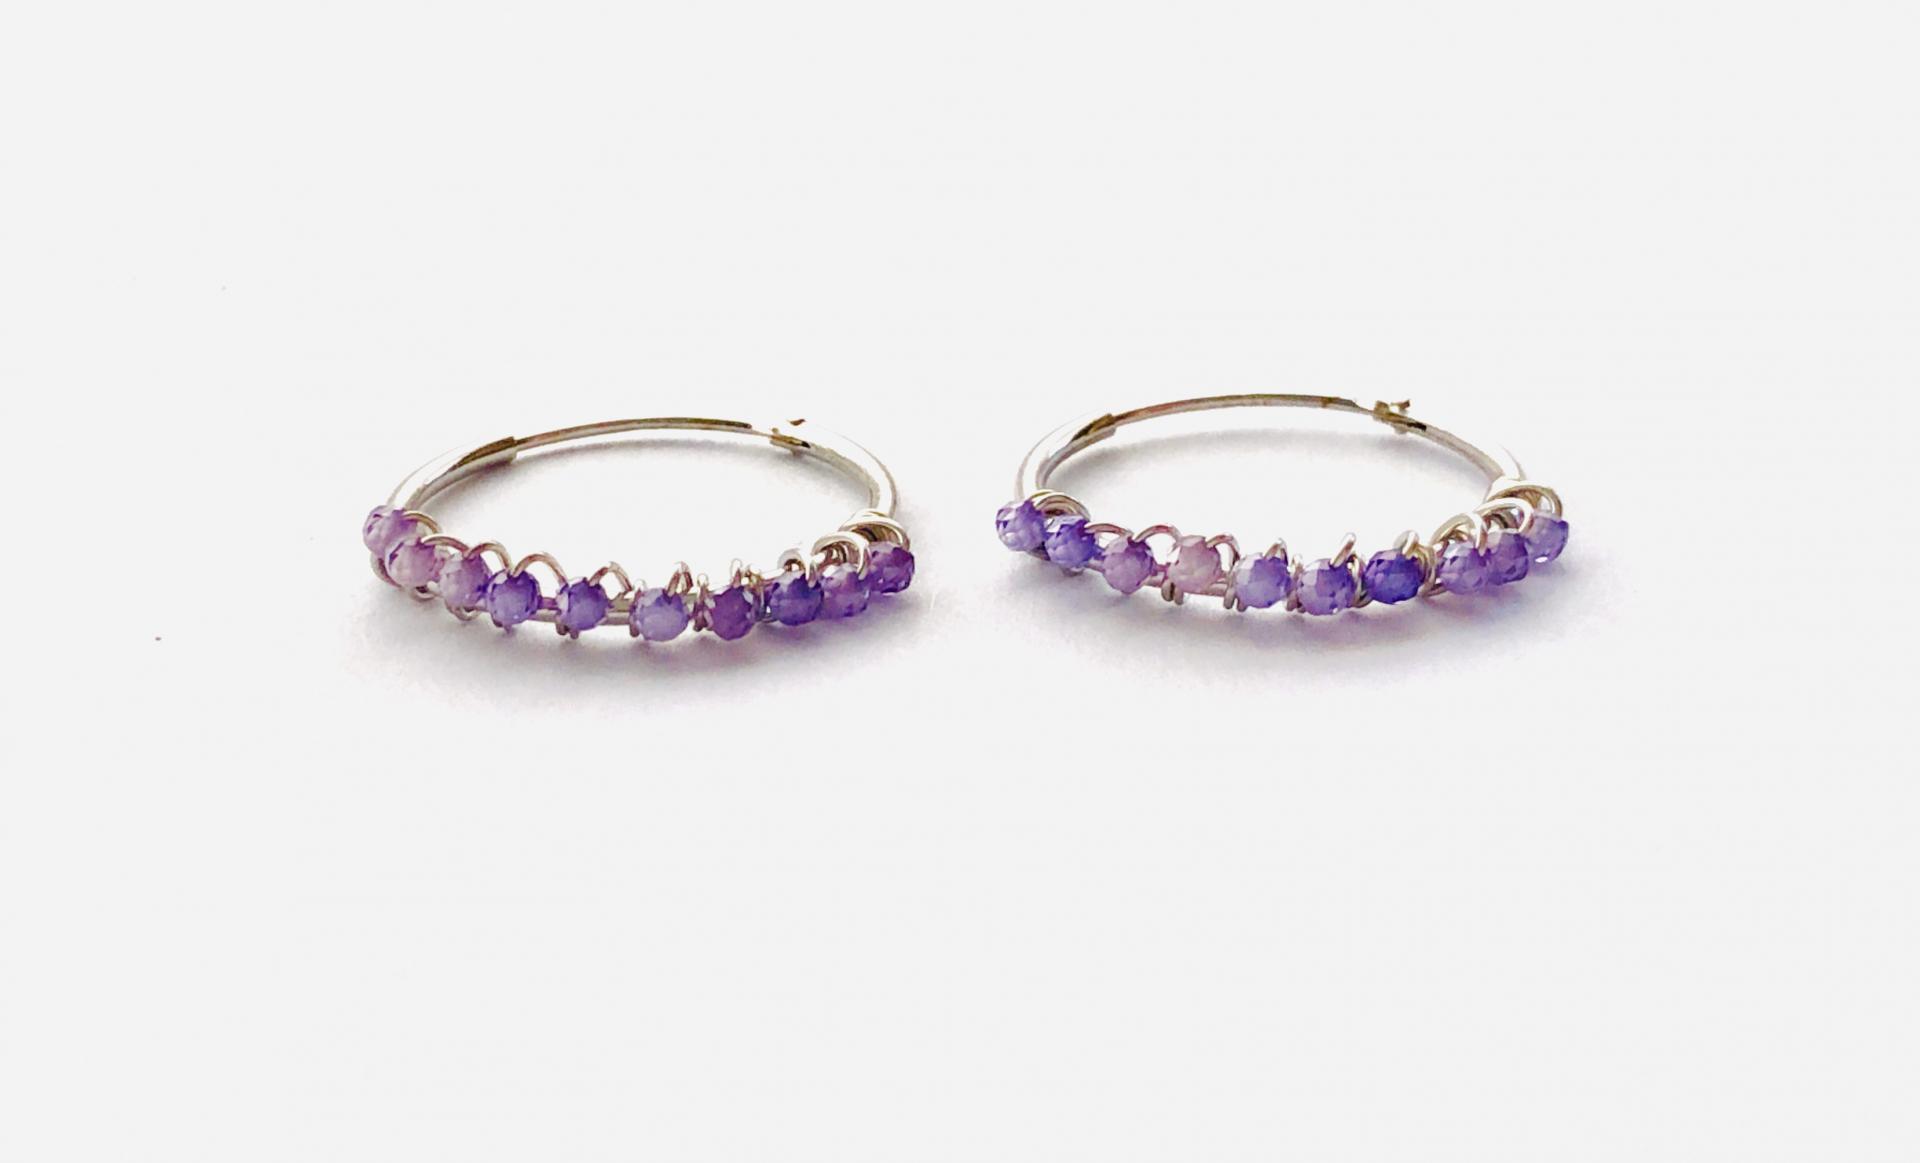 Aros de 20mm de plata con cristales violeta Swarovski